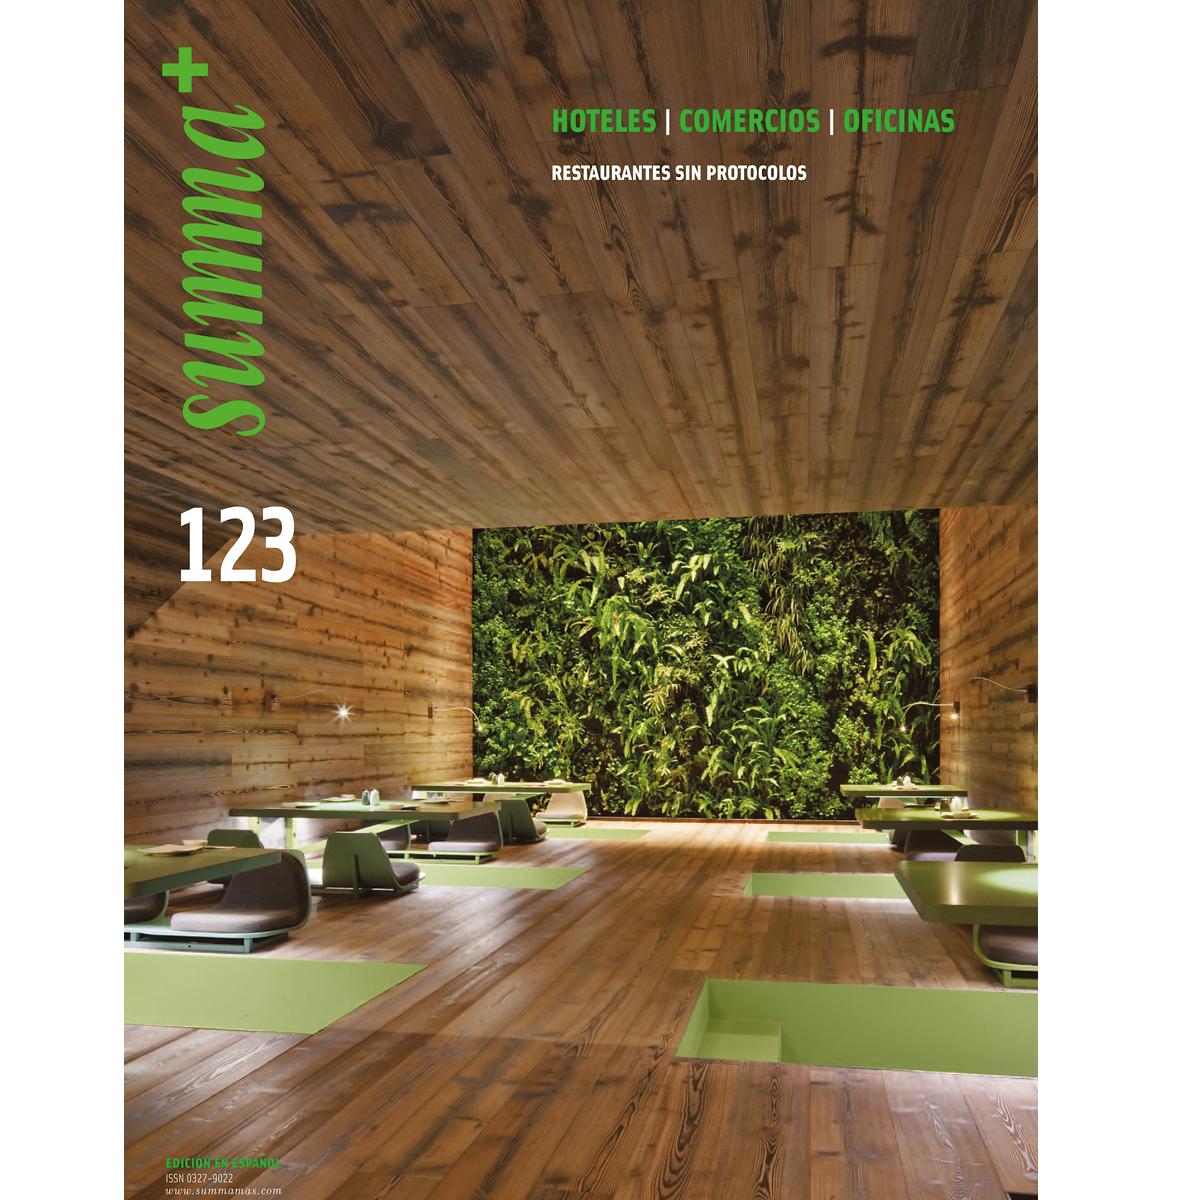 Summa+: Hoteles / Comercios / Oficinas